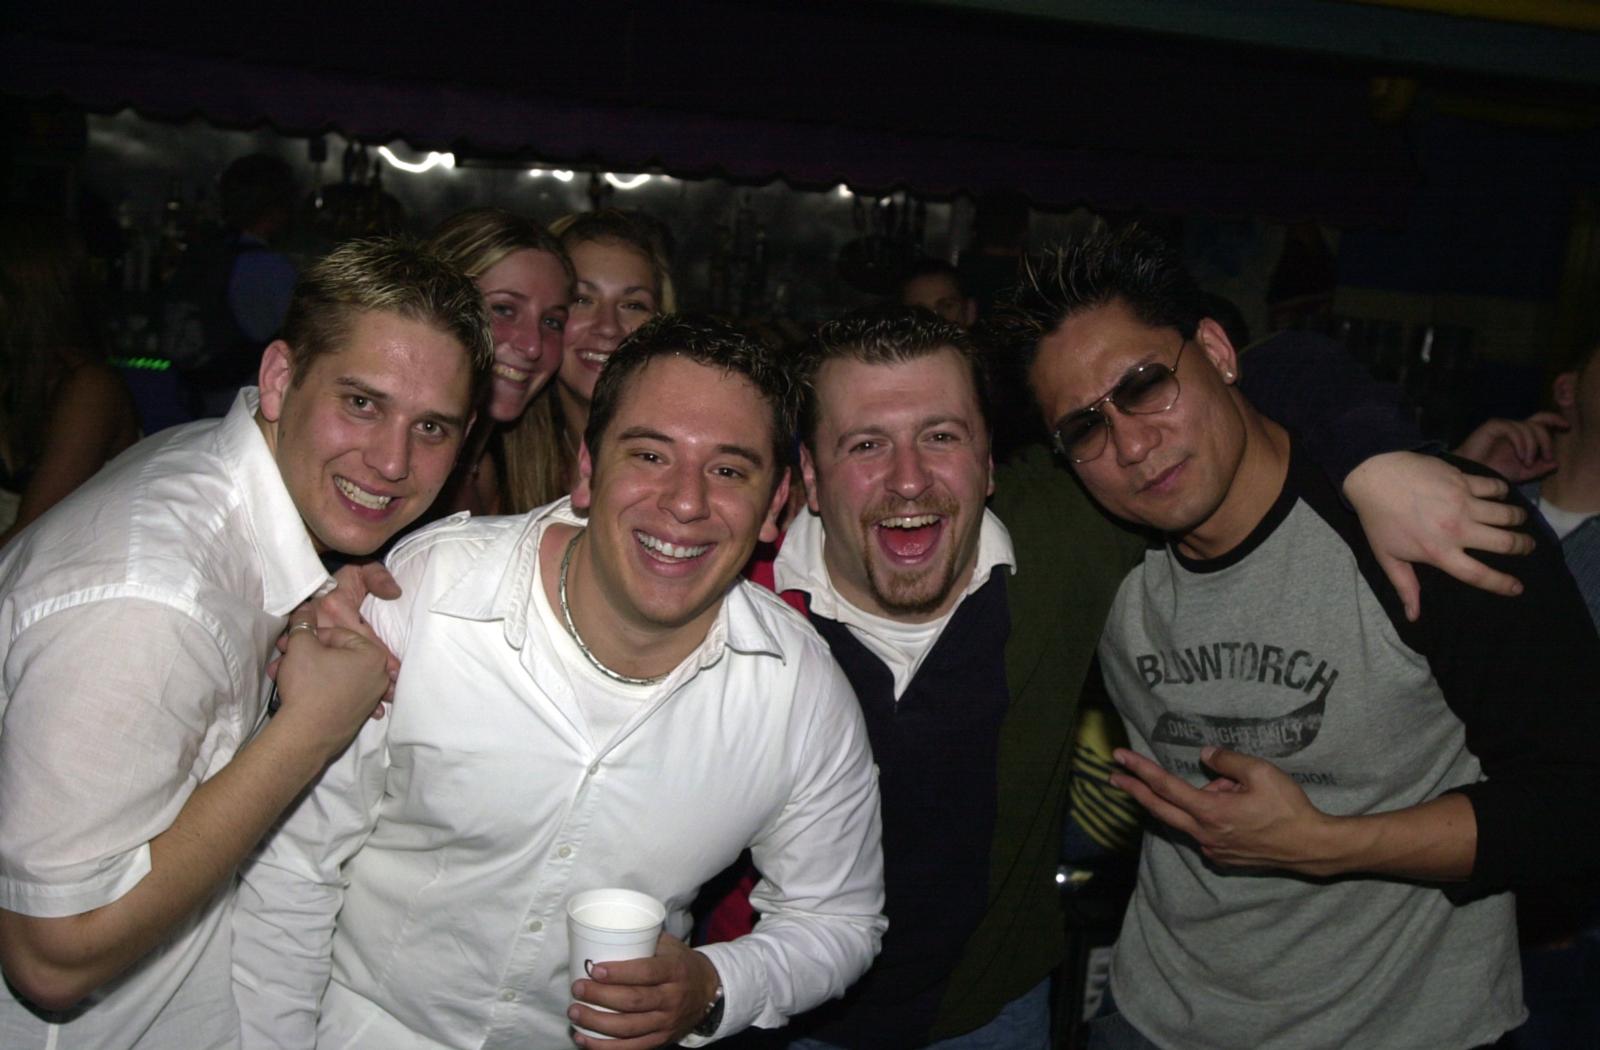 Erik, Me, DJ Mike Z, DJ Speed and college girls :)